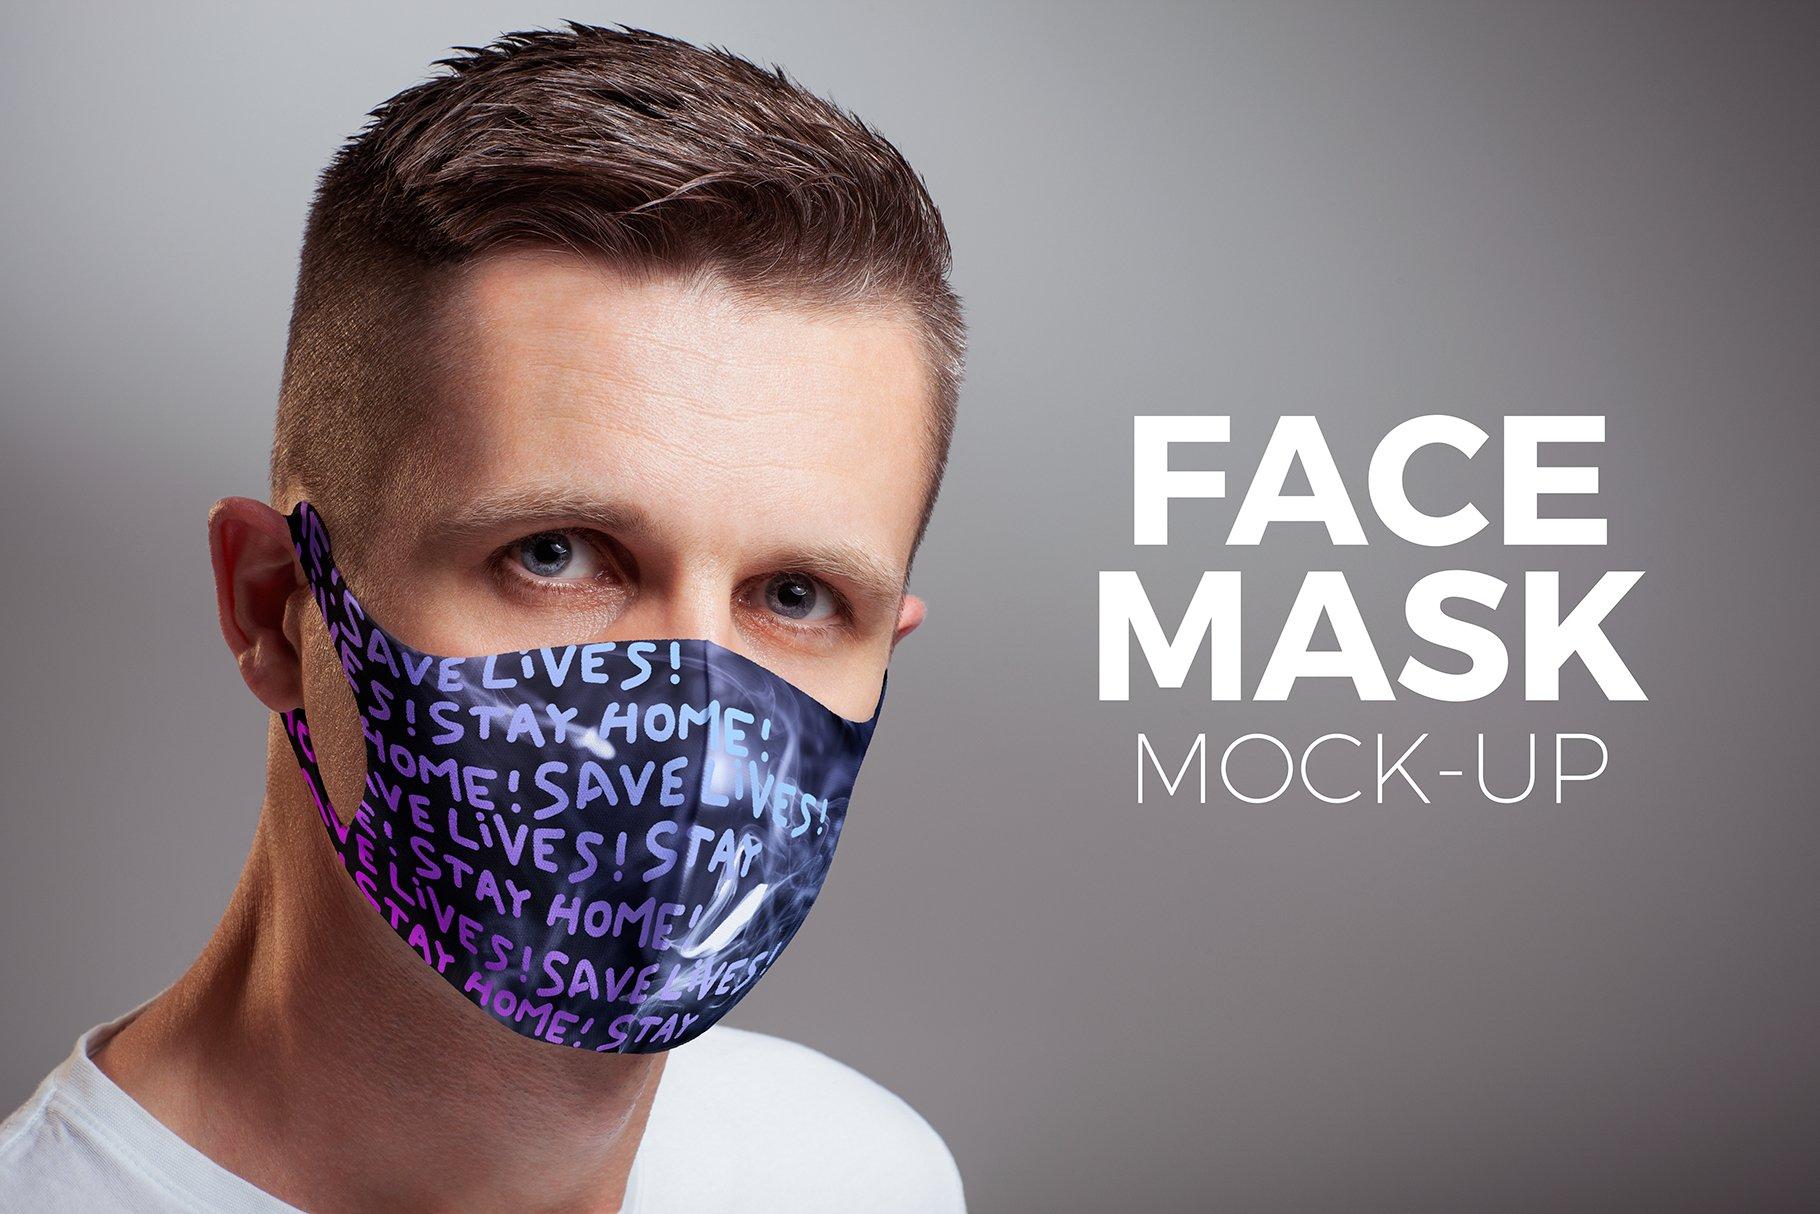 Face Mask Mock-up example image 1